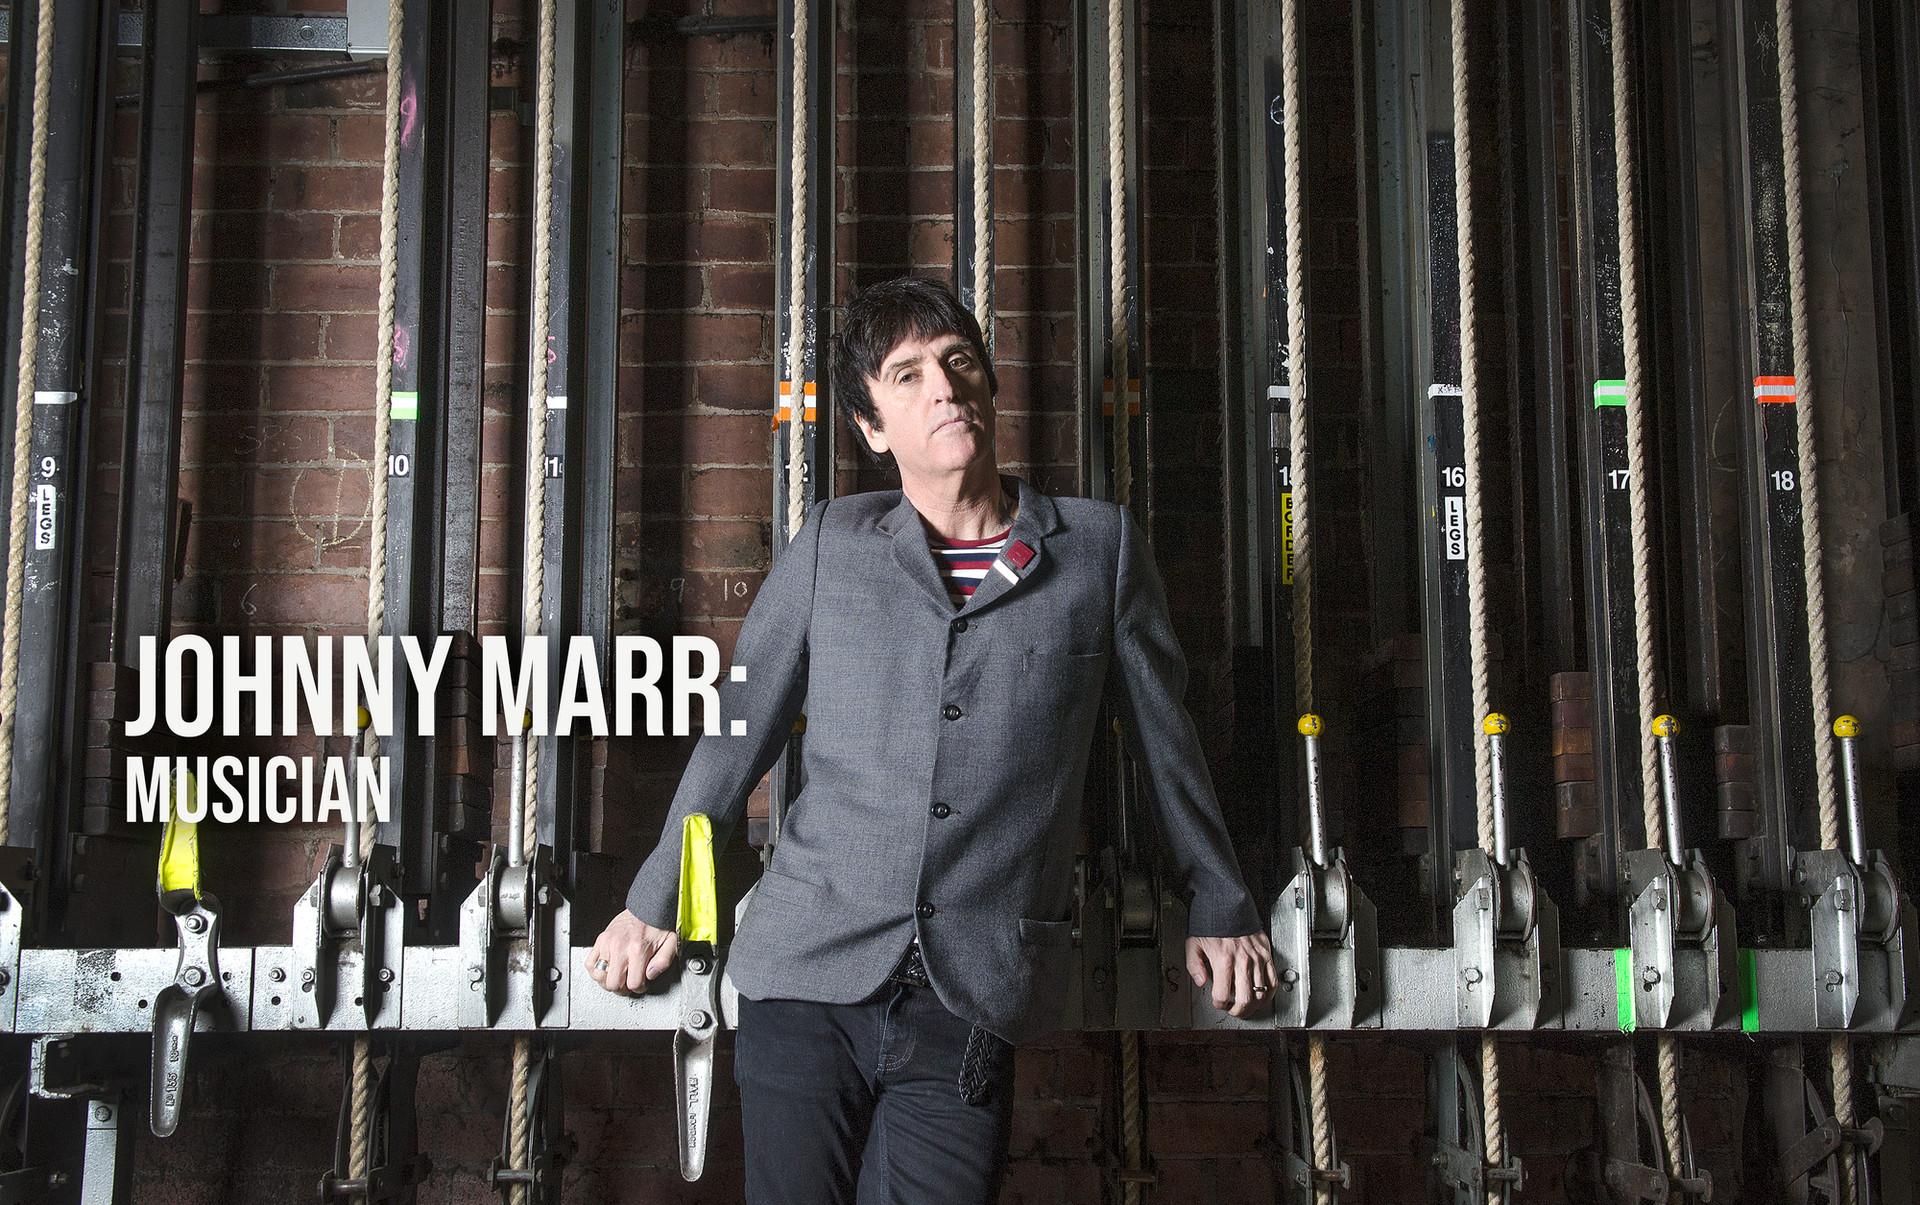 Harry-Johnny-Title.jpg